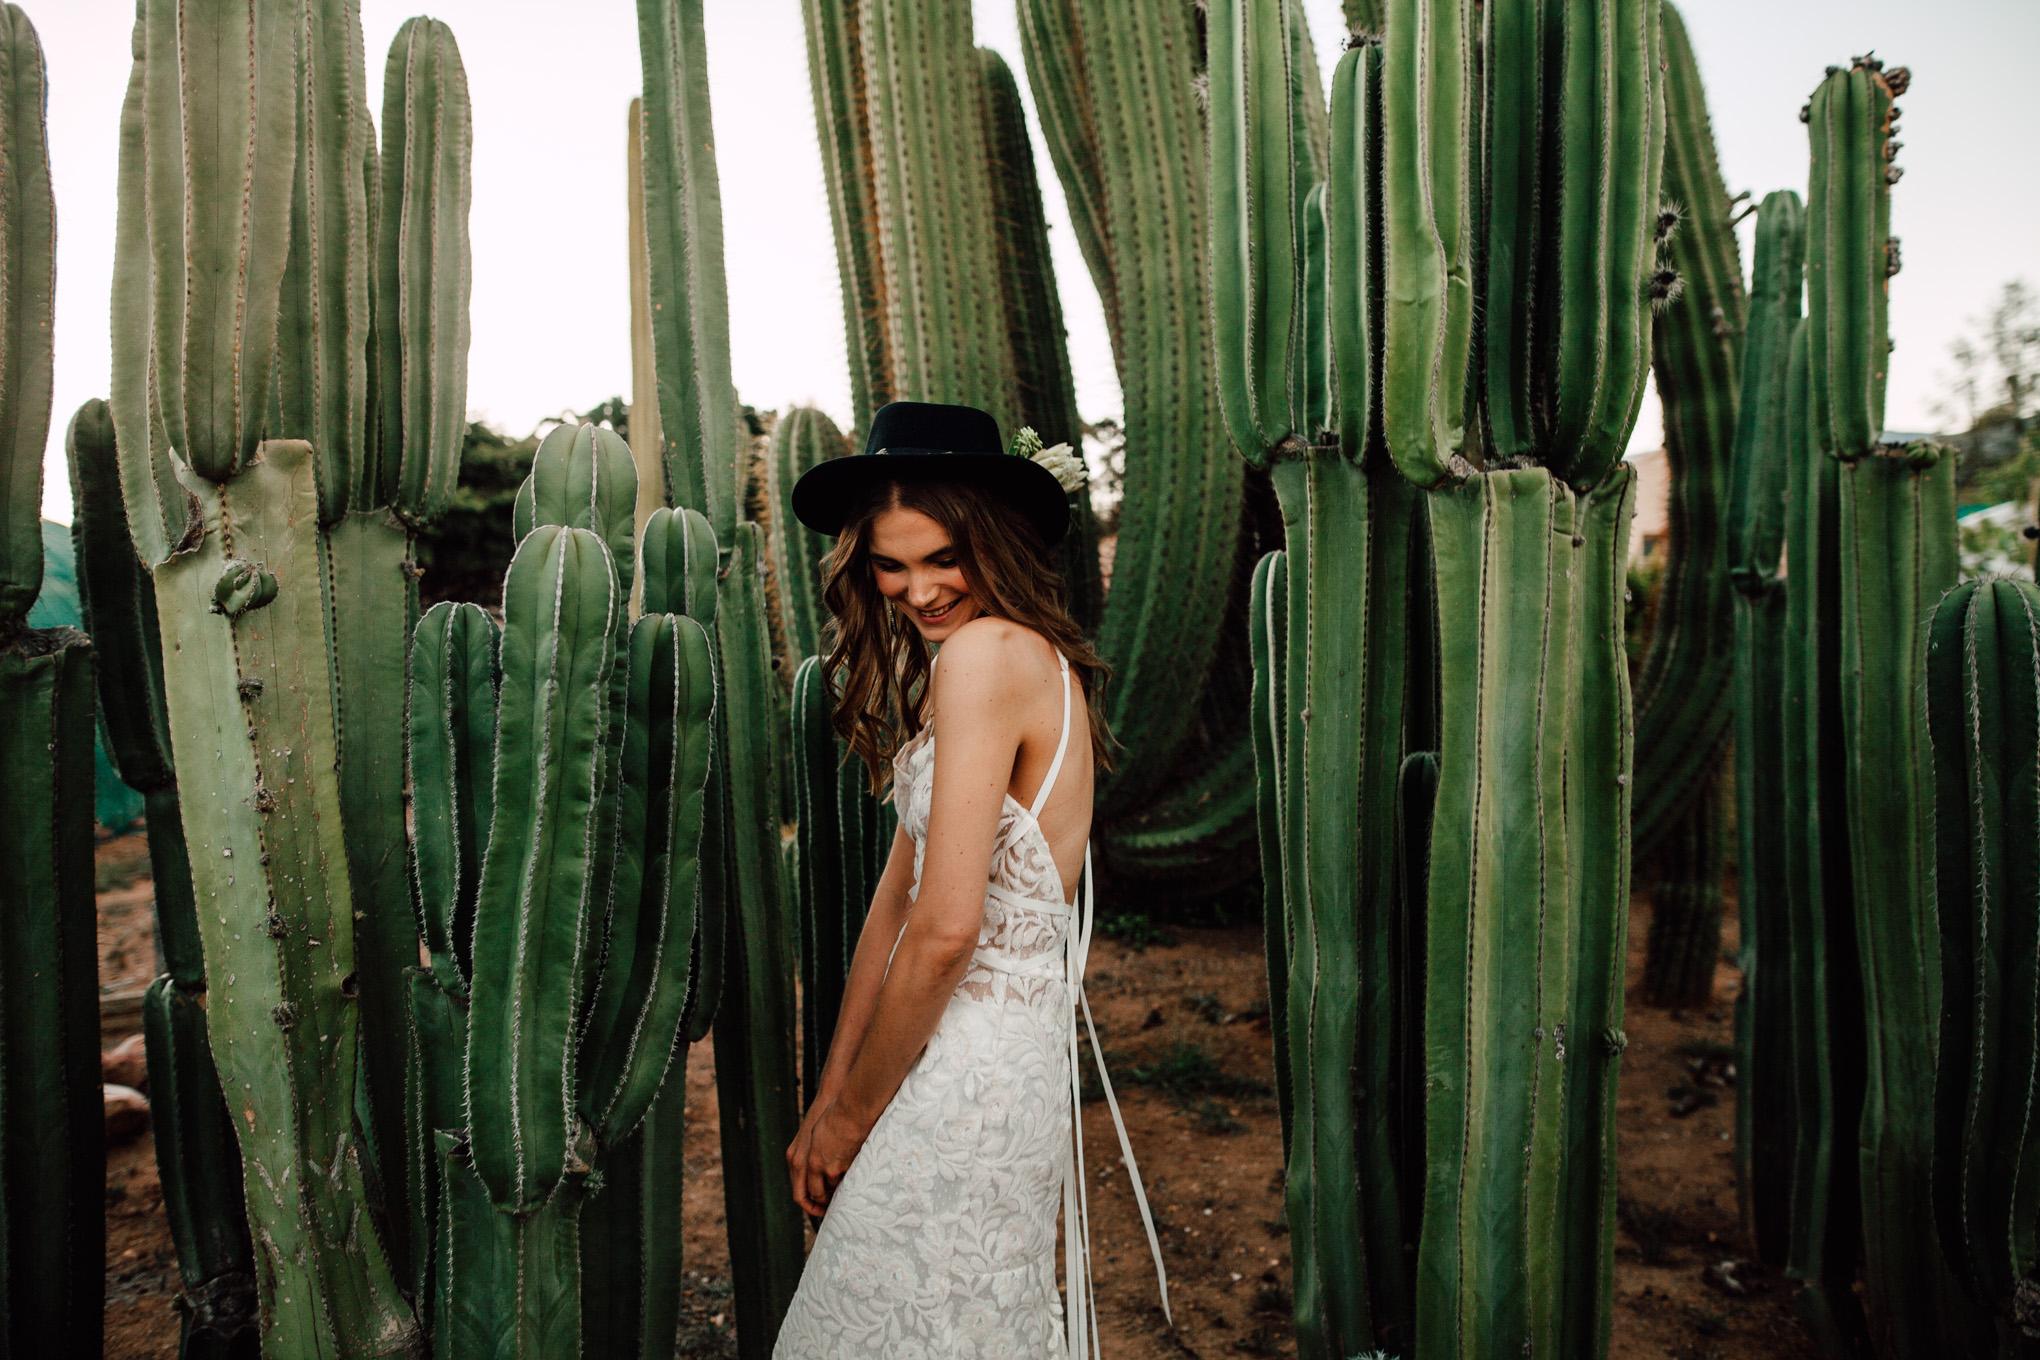 Cape-Town-Pia-Anna-Christian-Wedding-Photography-South-Africa-Bride-Cactus-25.jpg